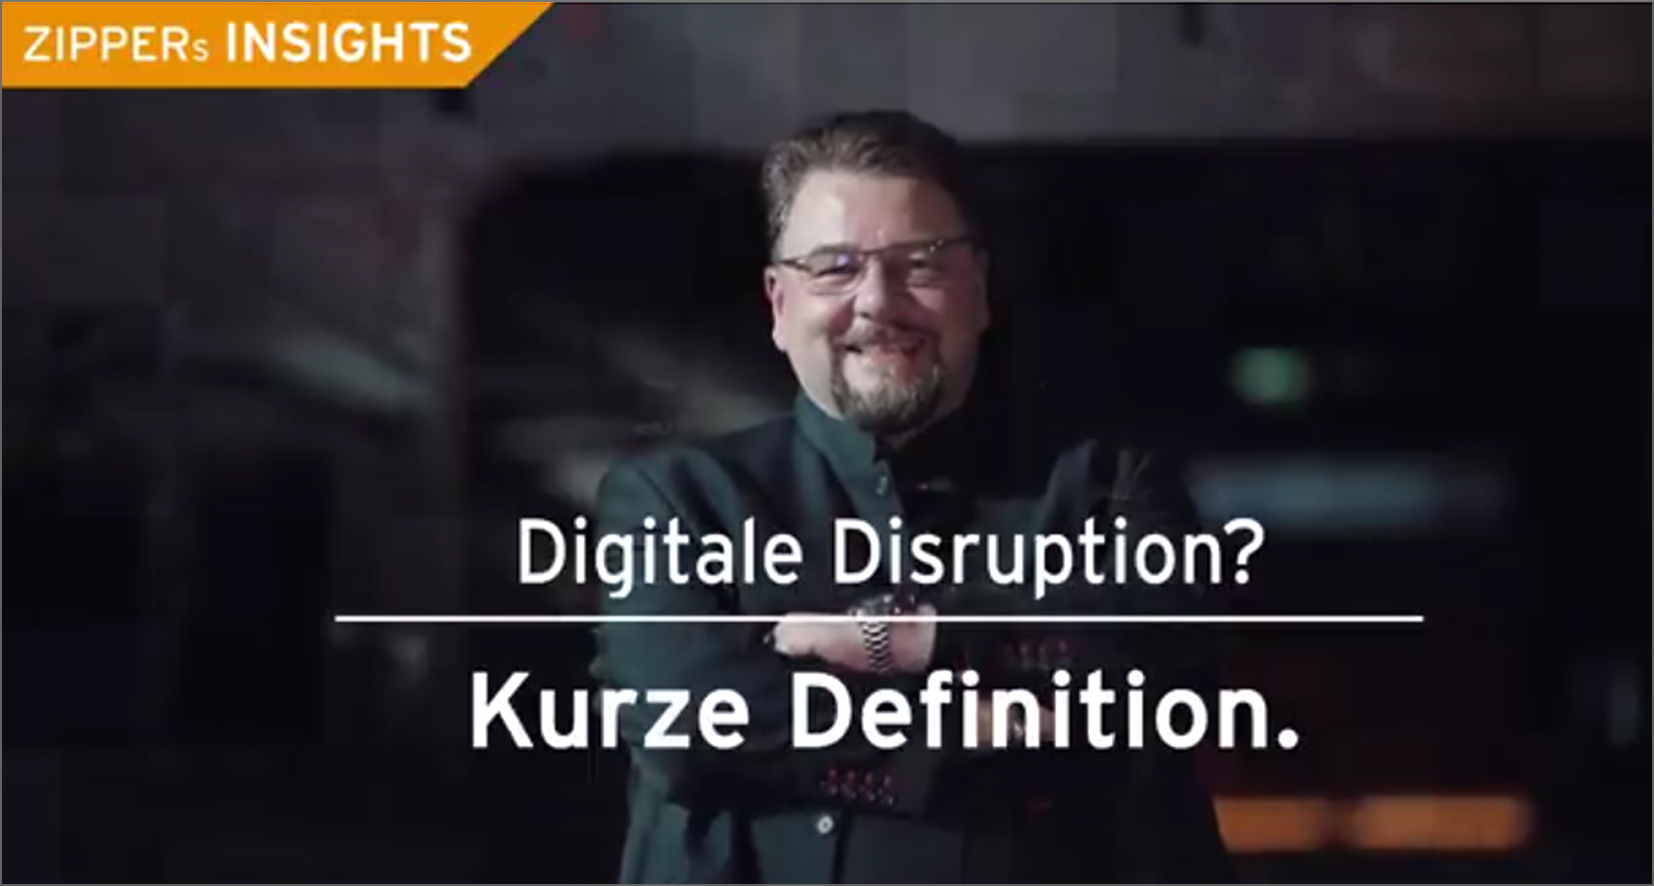 ZIPPERs INSIGHTS: Folge 2 ist online – Digitale Disruption? Kurze Definition.